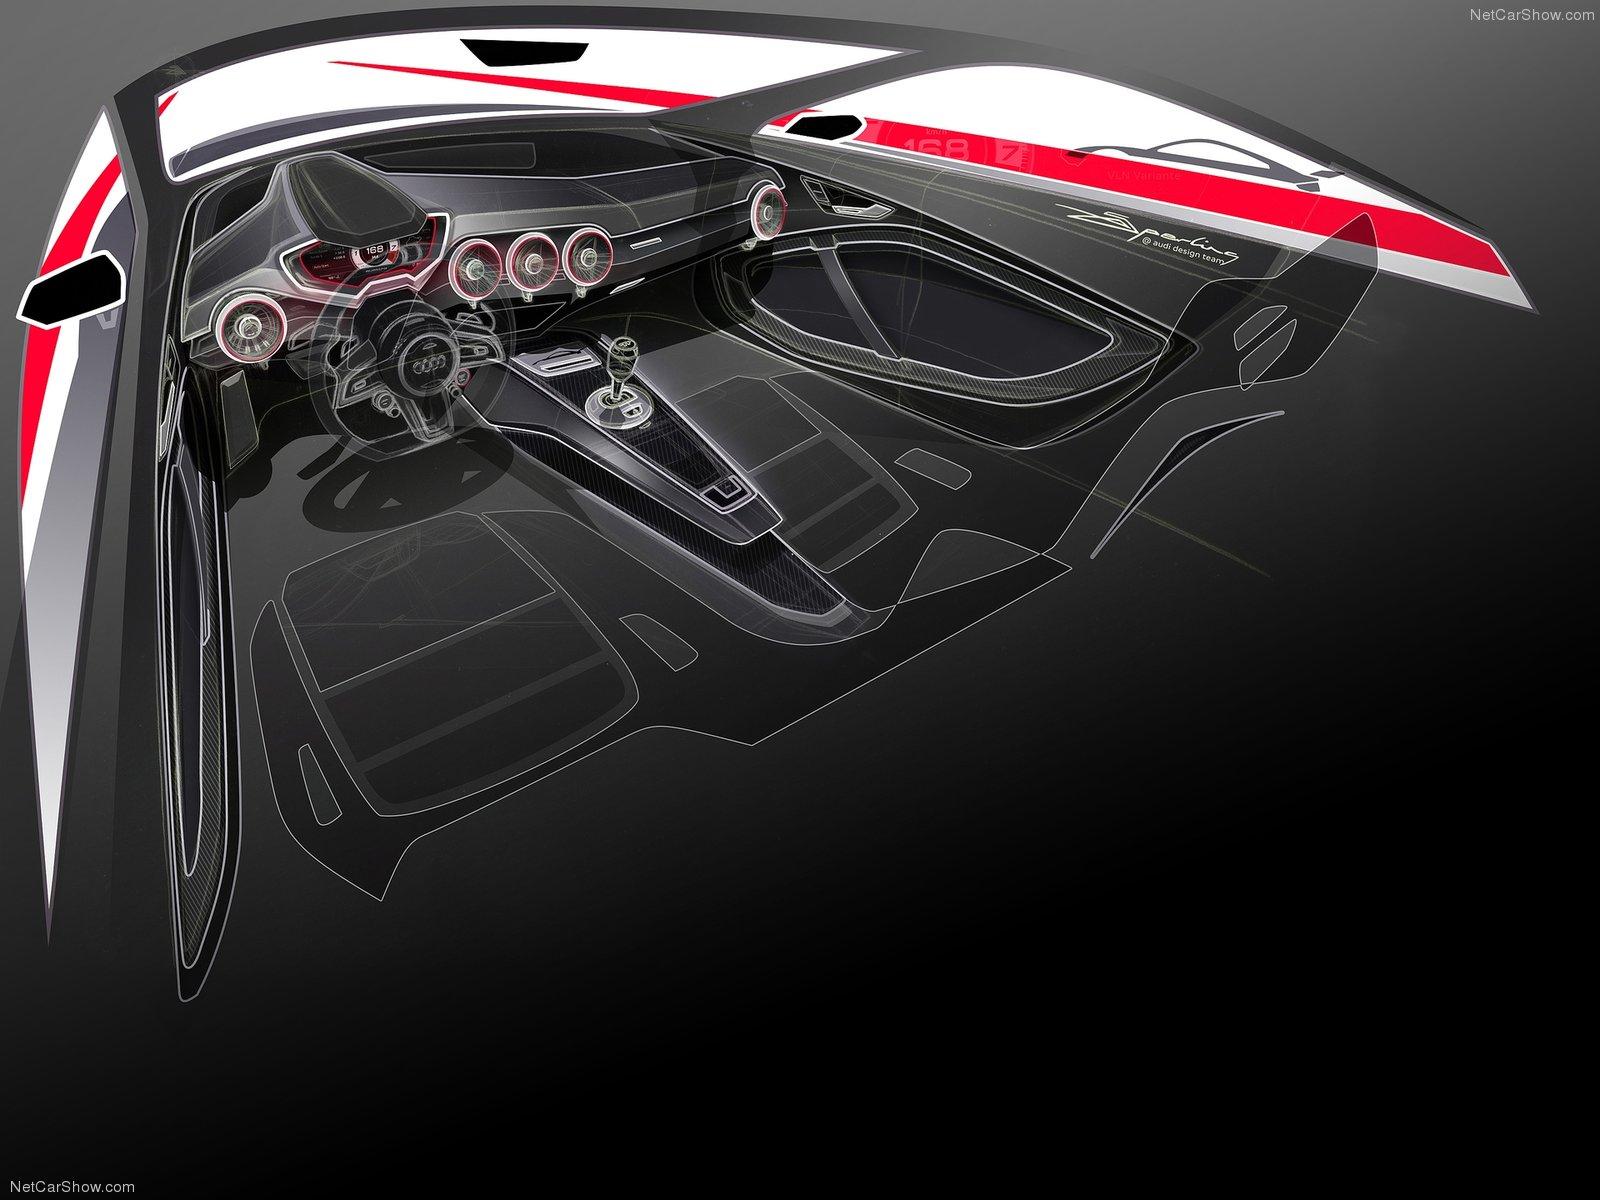 Audi Tt Quattro Sport Concept Photos Photo Gallery Page